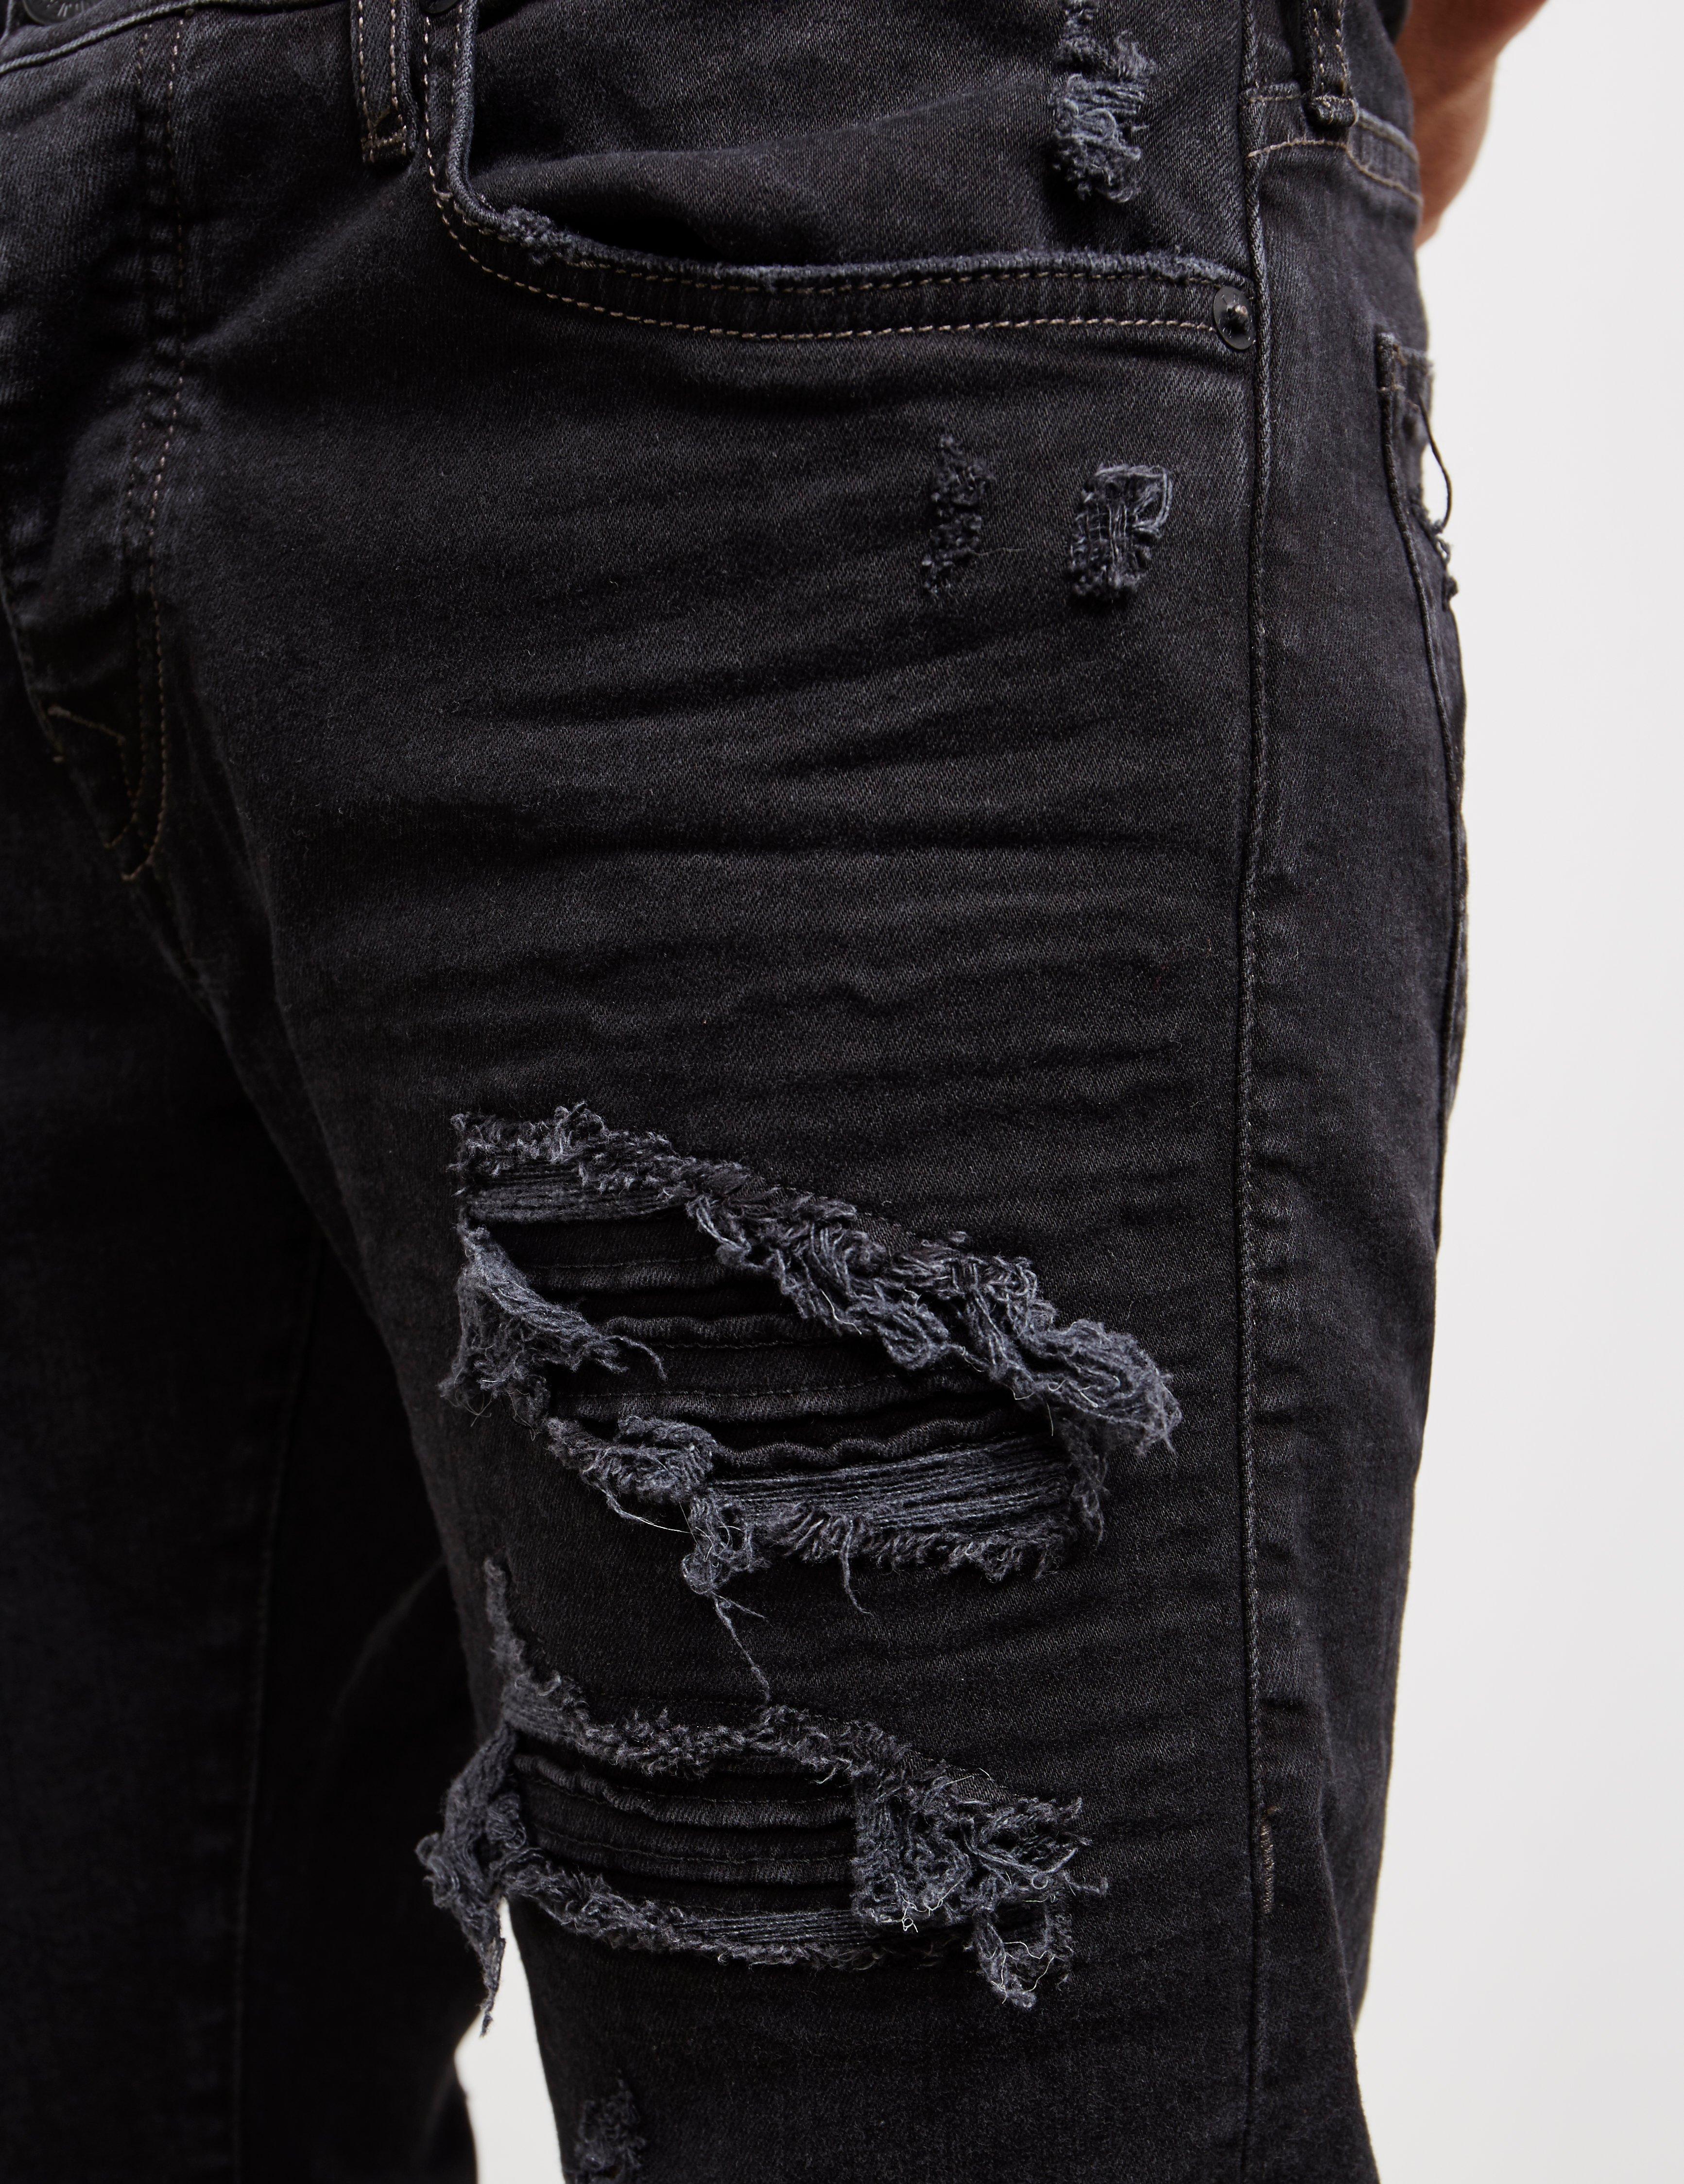 42fecd5e True Religion - Rocco Biker Jeans Black for Men - Lyst. View fullscreen